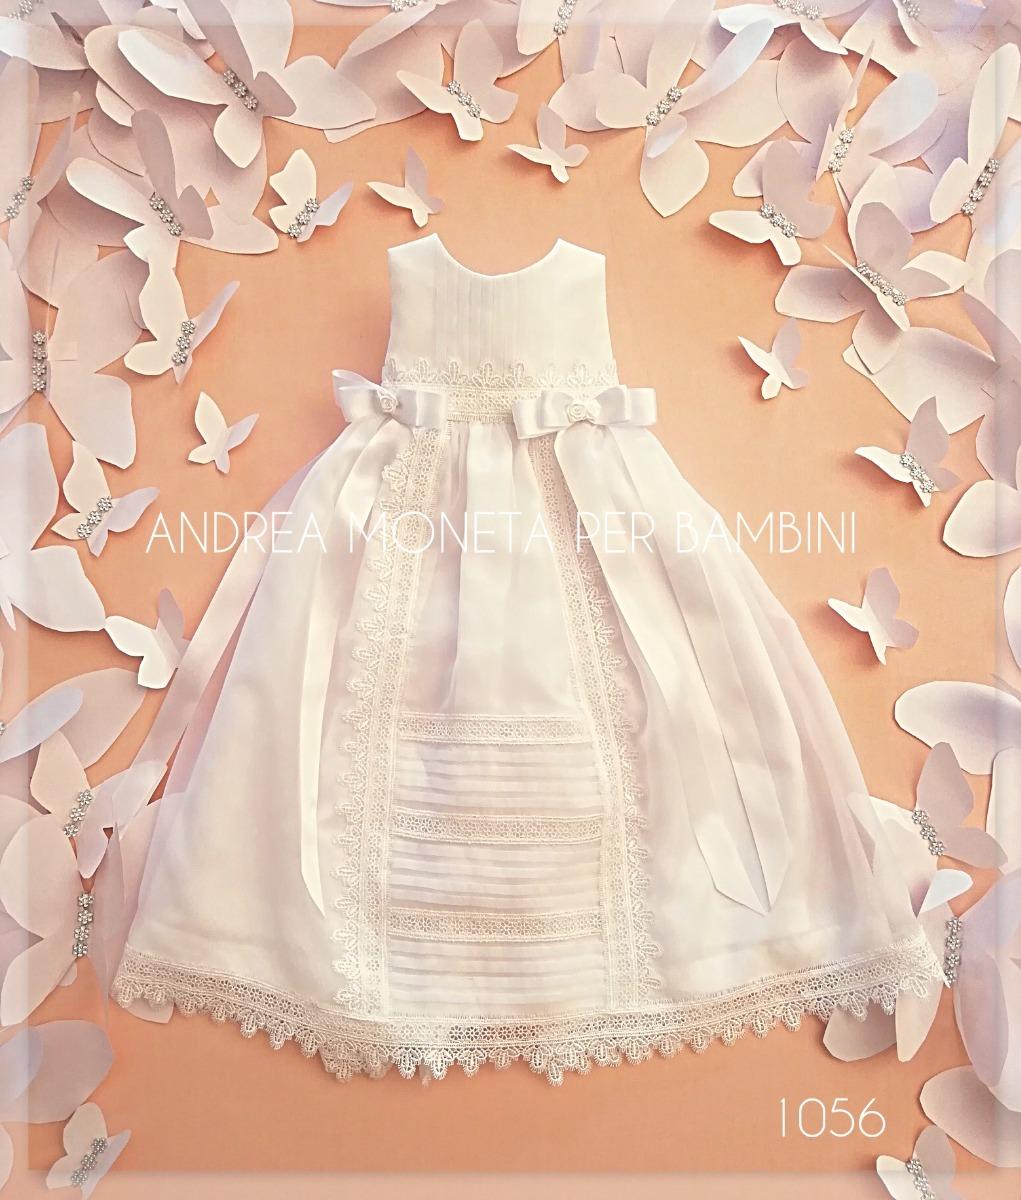 Hermoso Vestido Blanco Bautismo Bebe Andrea Moneta 1056 - $ 5.500,00 ...